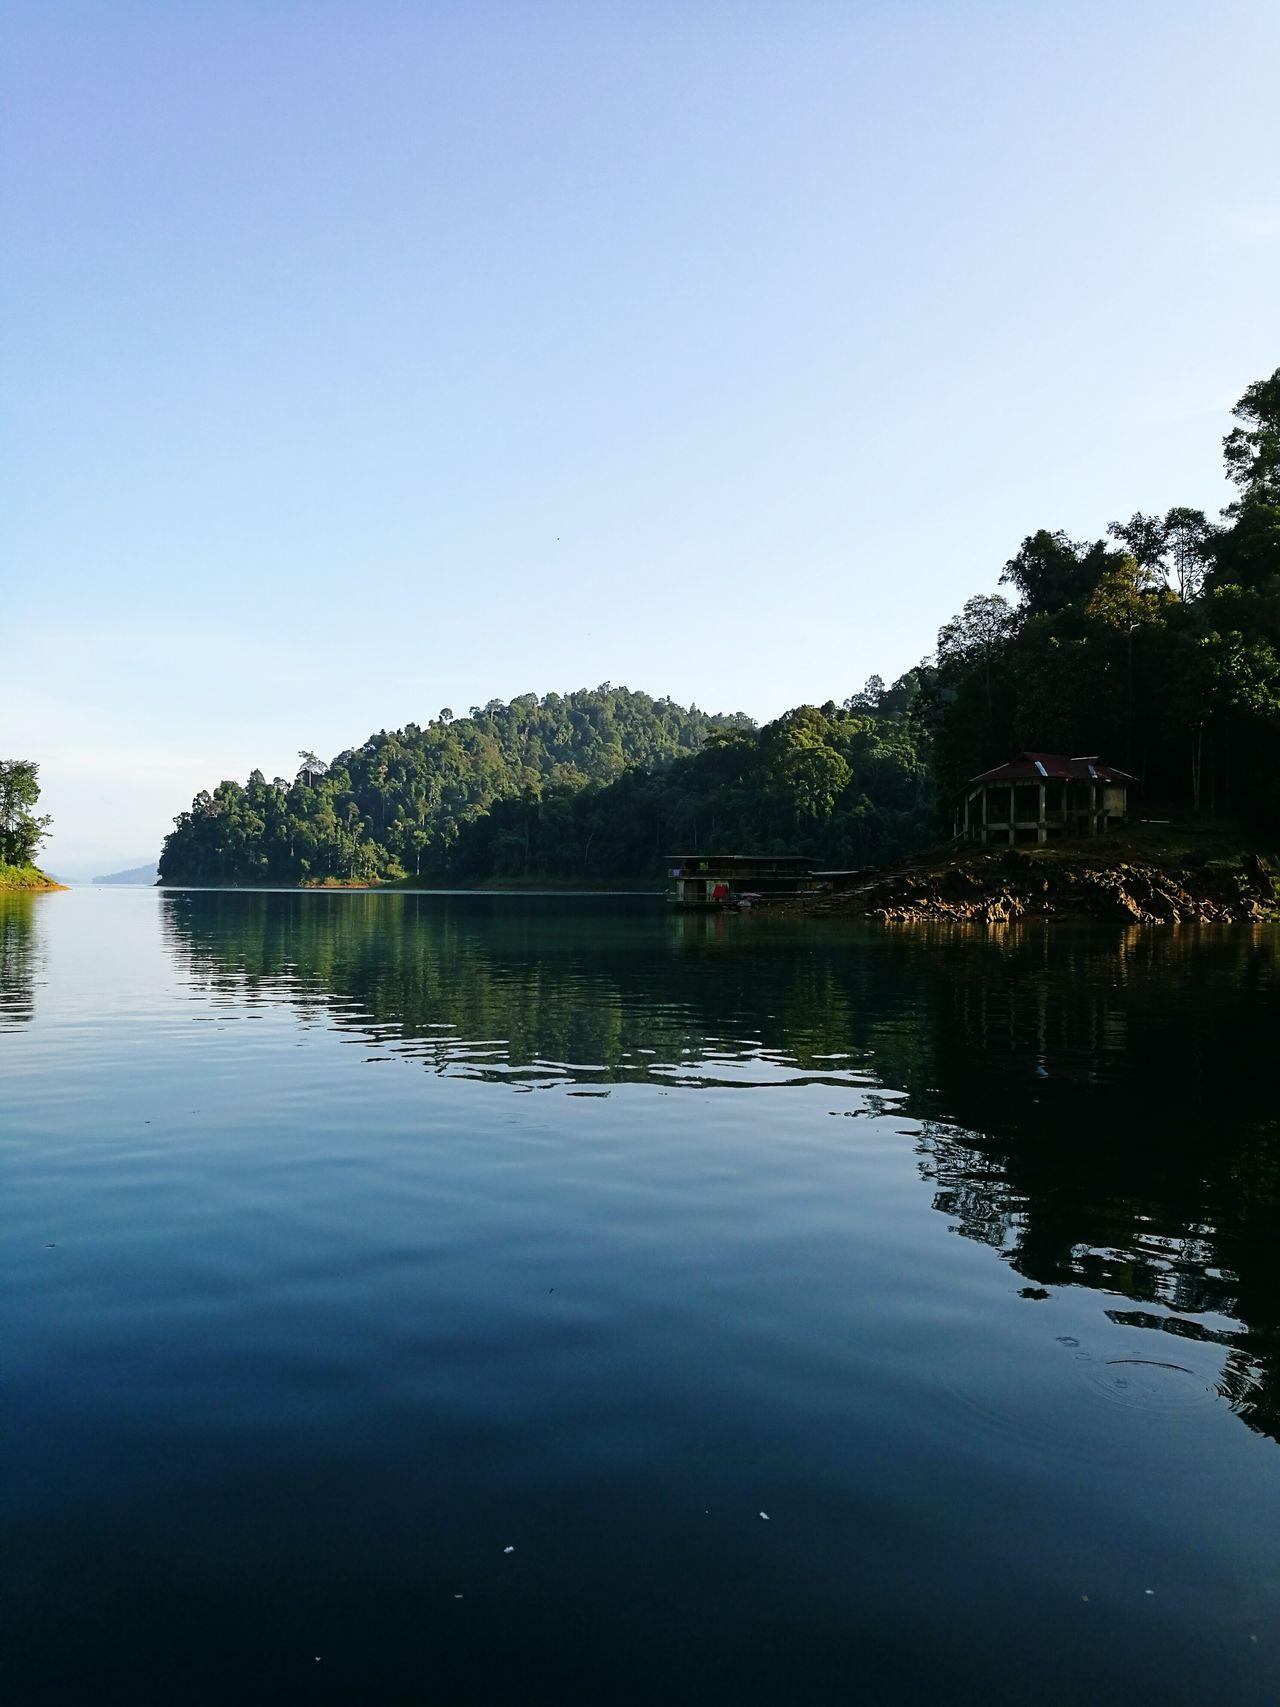 Reflection Water Tree Sky Lake Aquatic Nature Reflection Lake No People Outdoors Kenyir Kenyir Lake Terengganu